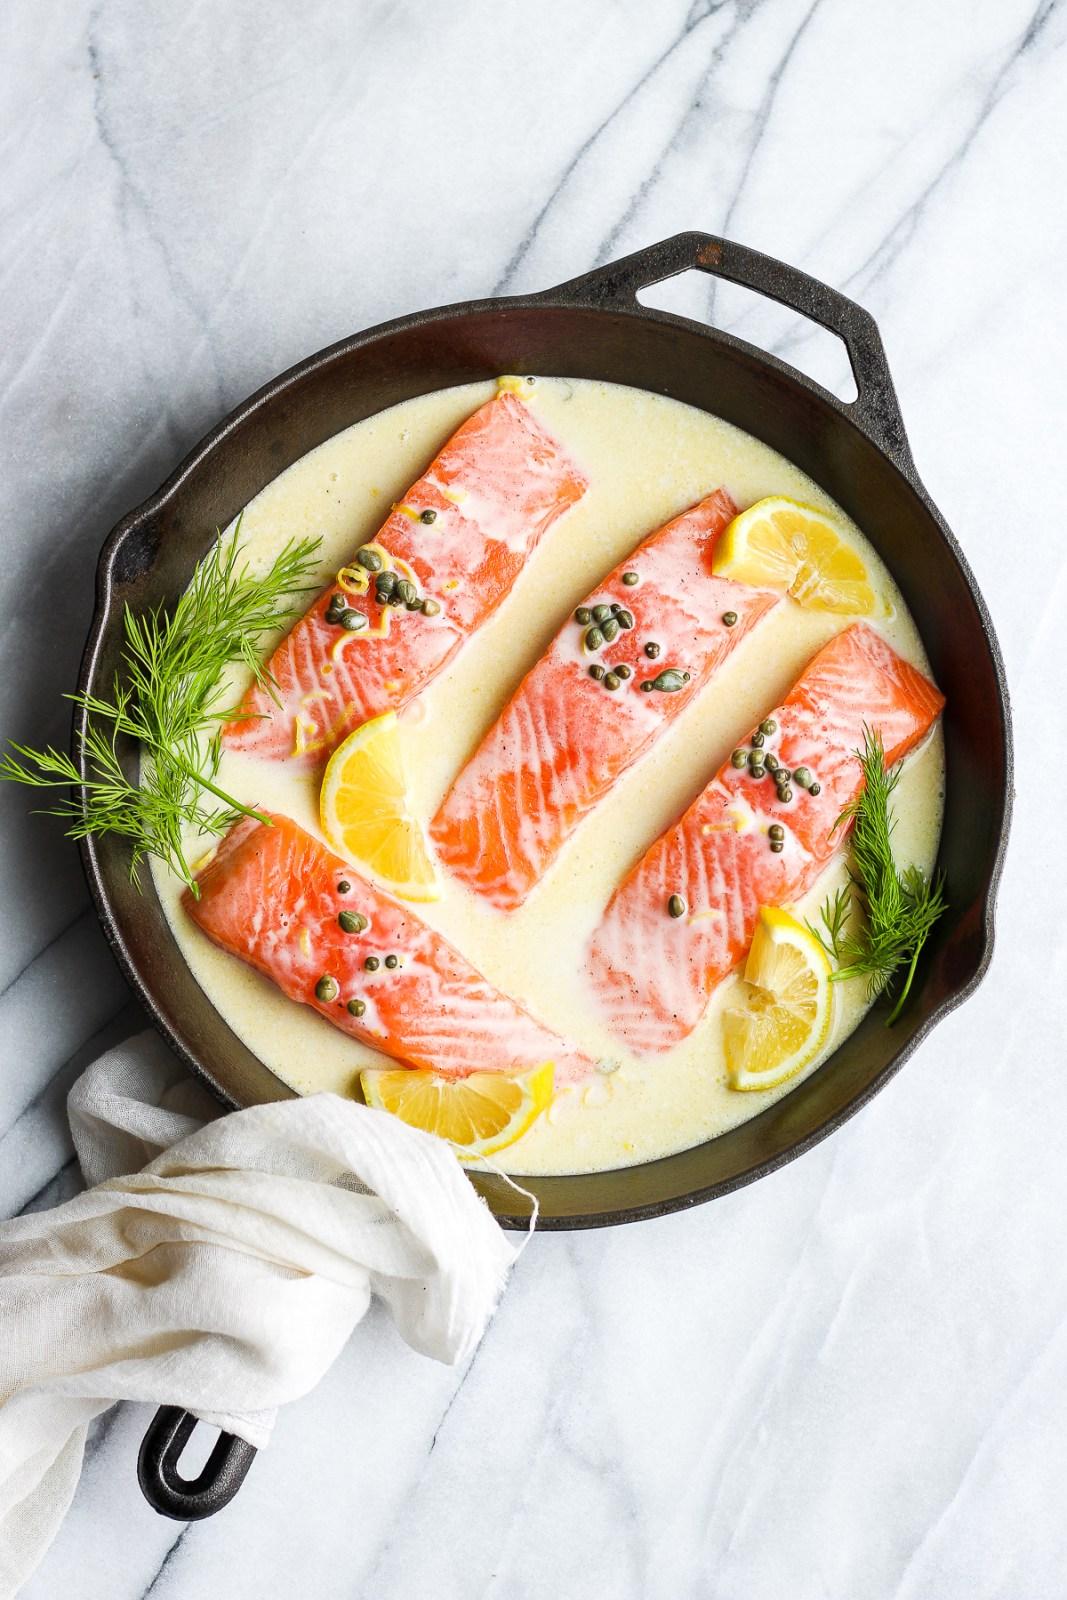 Creamy-Lemon-Caper-Salmon-Skillet-edited-1.jpg